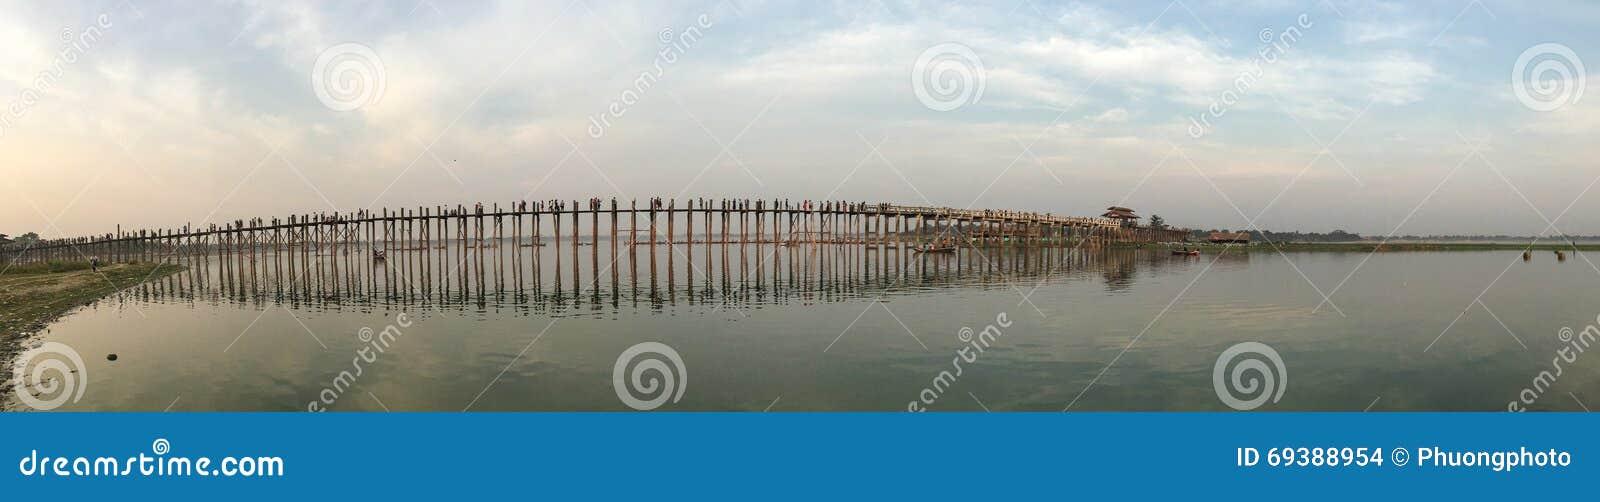 Panorama da ponte de Ubein em Mandalay, Myanmar